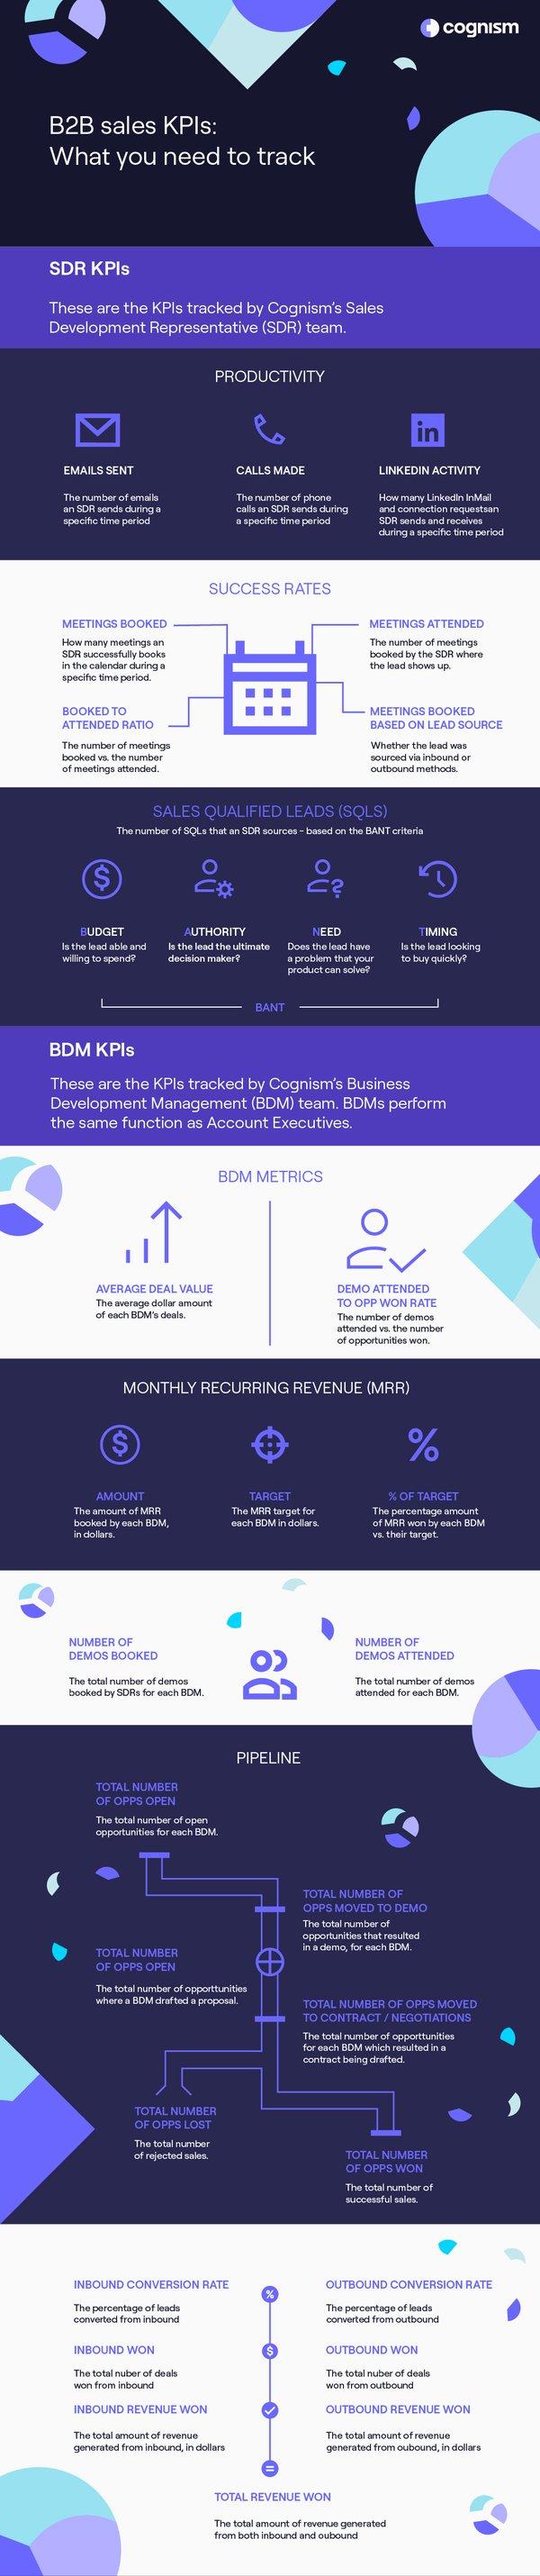 B2B Sales KPIs-1